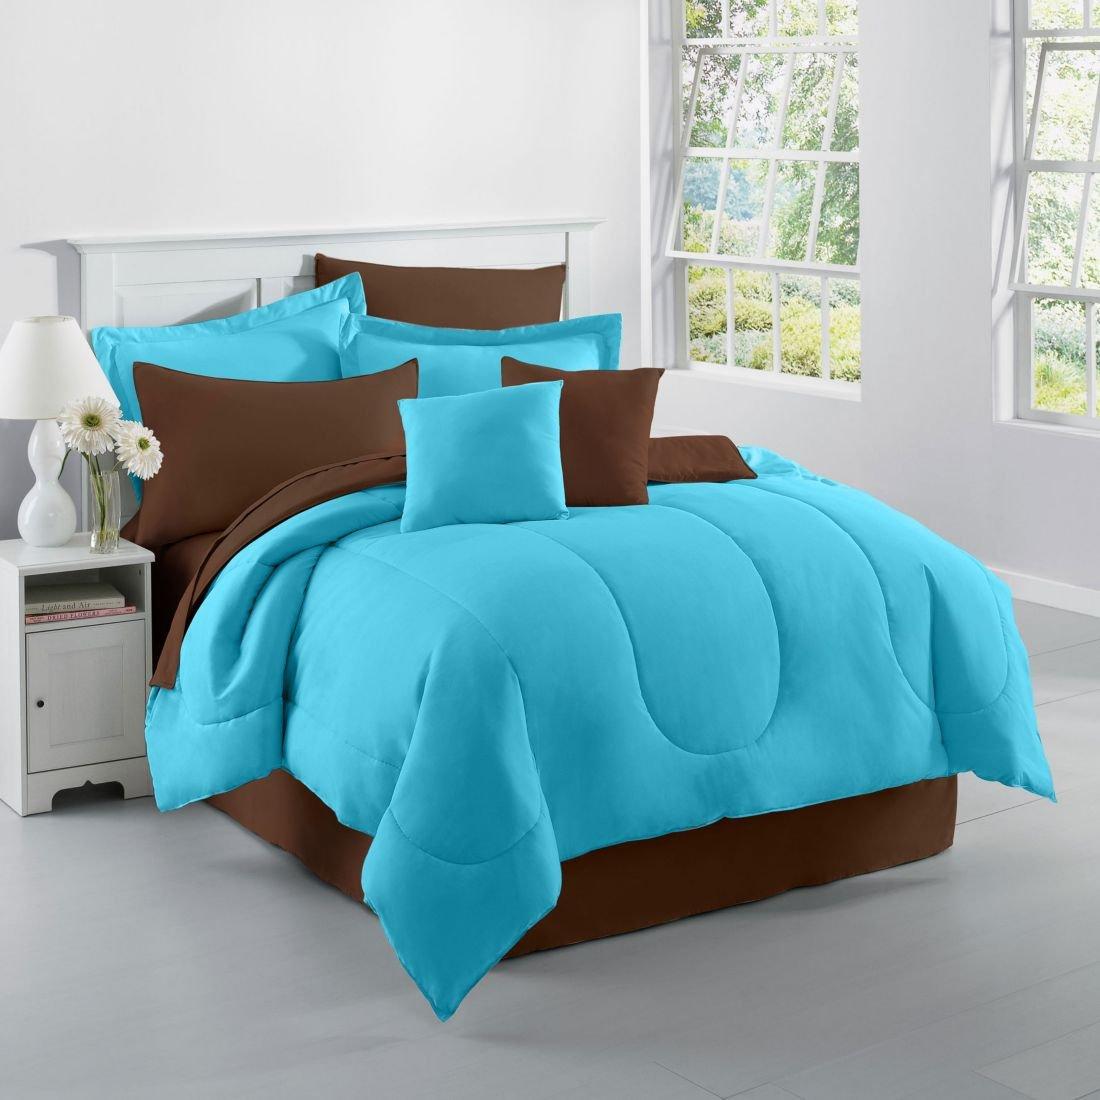 8pcs Jacquard Bedding Set Lilliy White Bed Mattress Sale